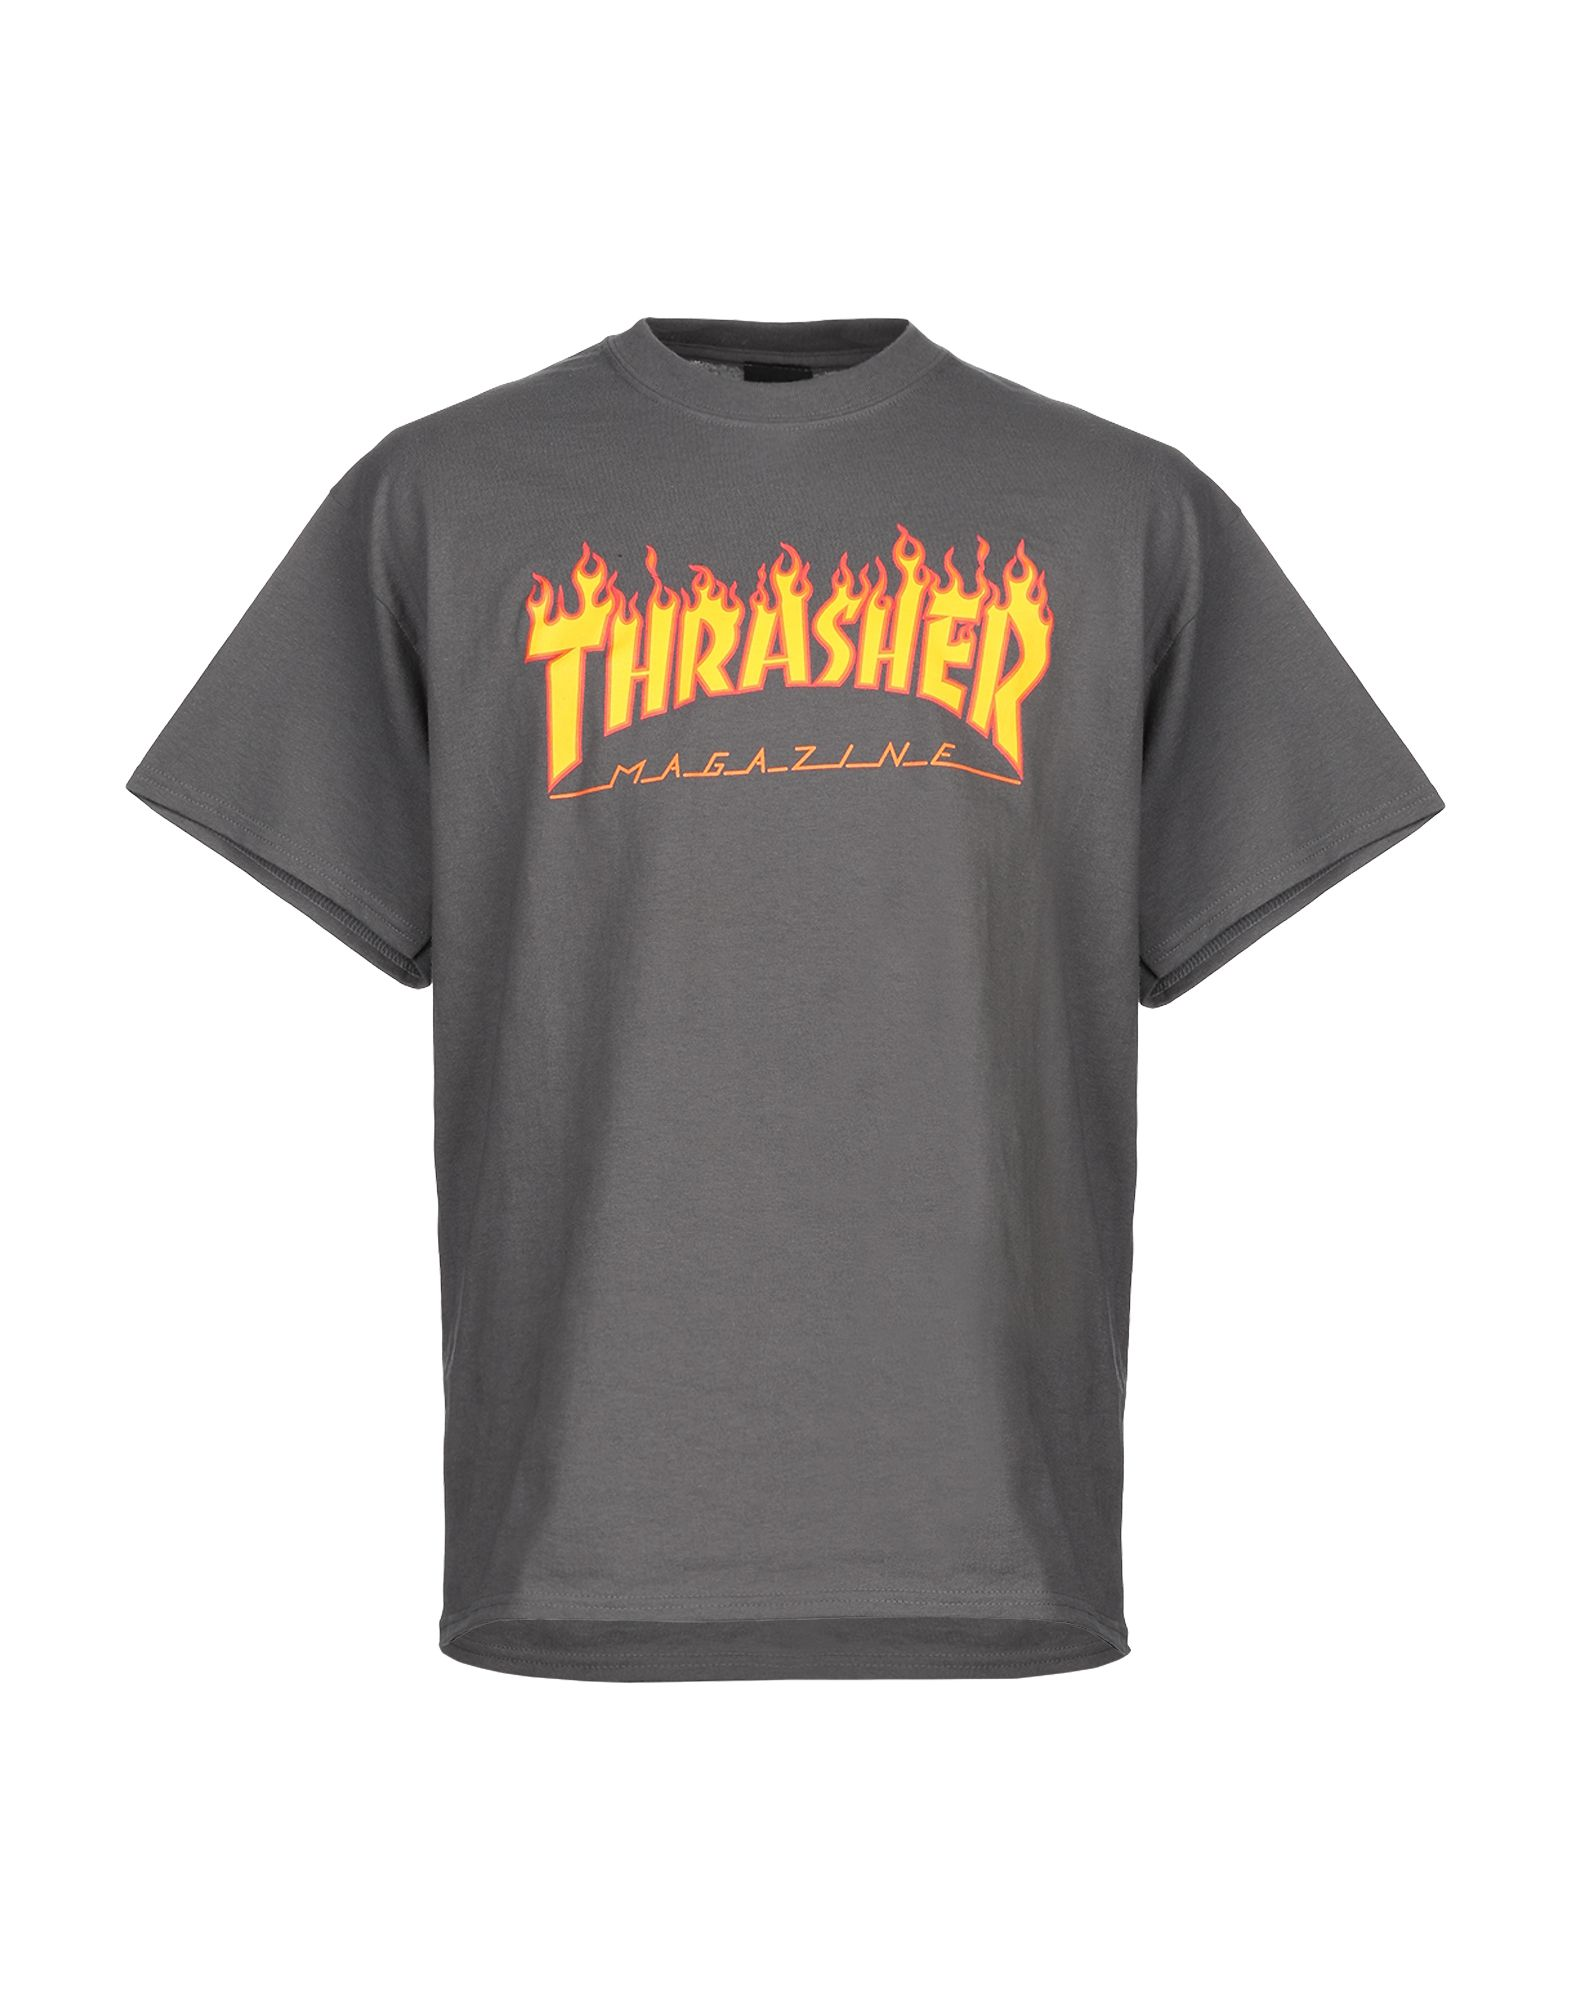 THRASHER Футболка футболка thrasher на алиэкспресс